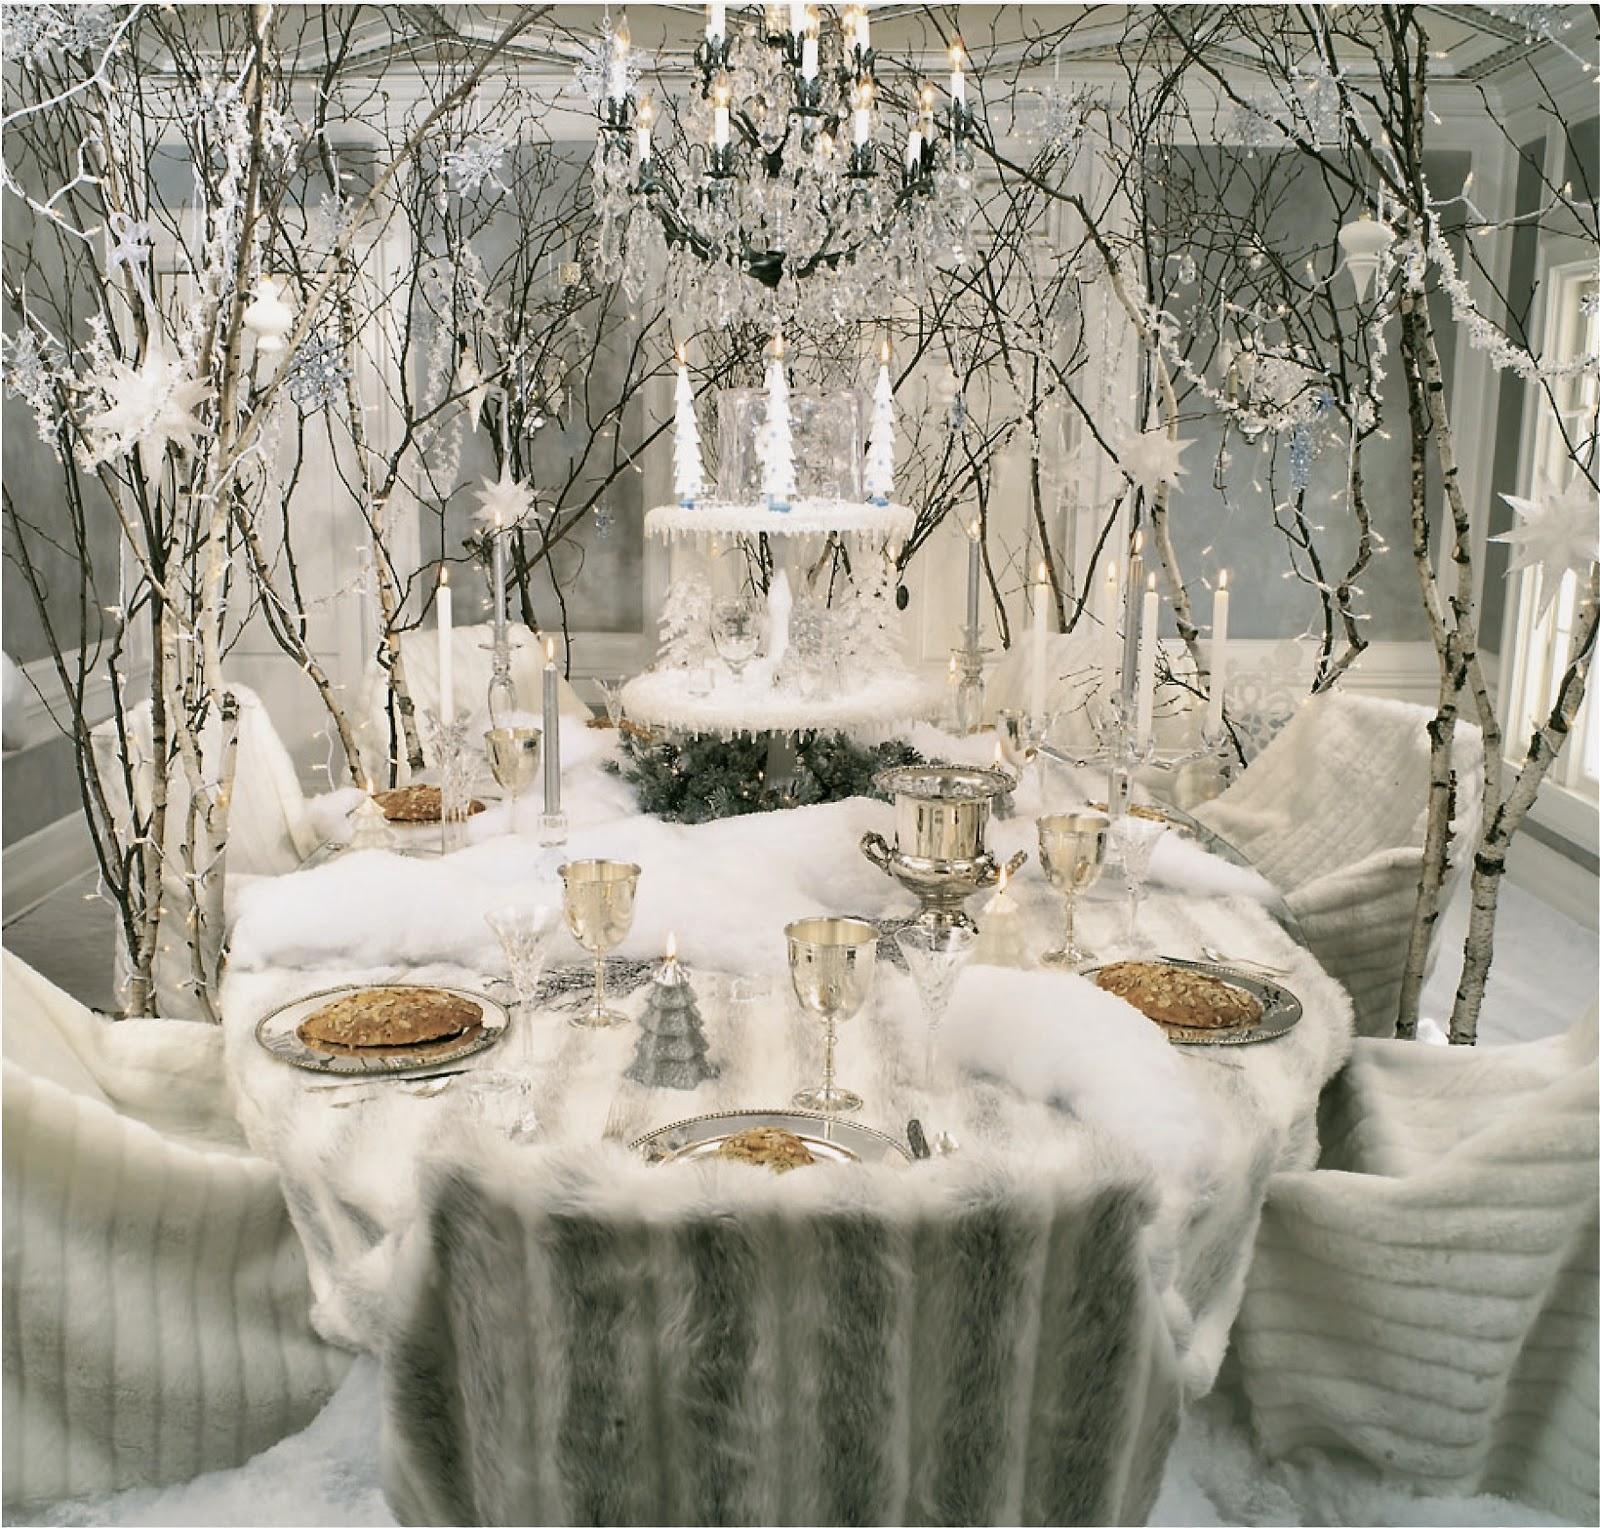 Winter Wonderland Table Life and Linda : 4afull from www.lifeandlinda.com size 1600 x 1528 jpeg 561kB